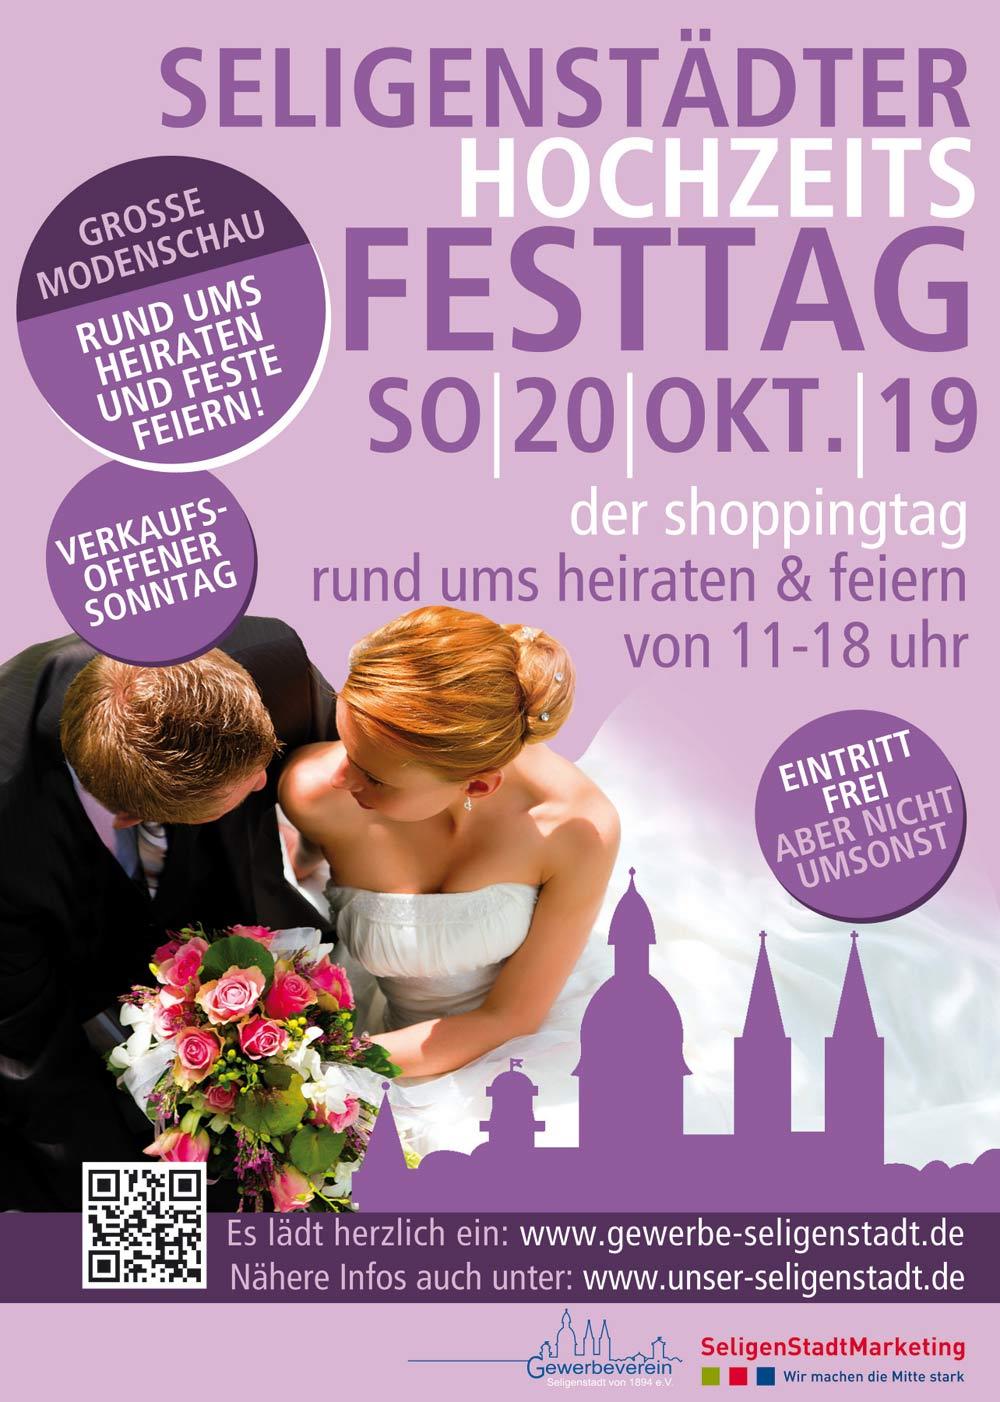 Unser Seligenstadt De Hochzeitstag